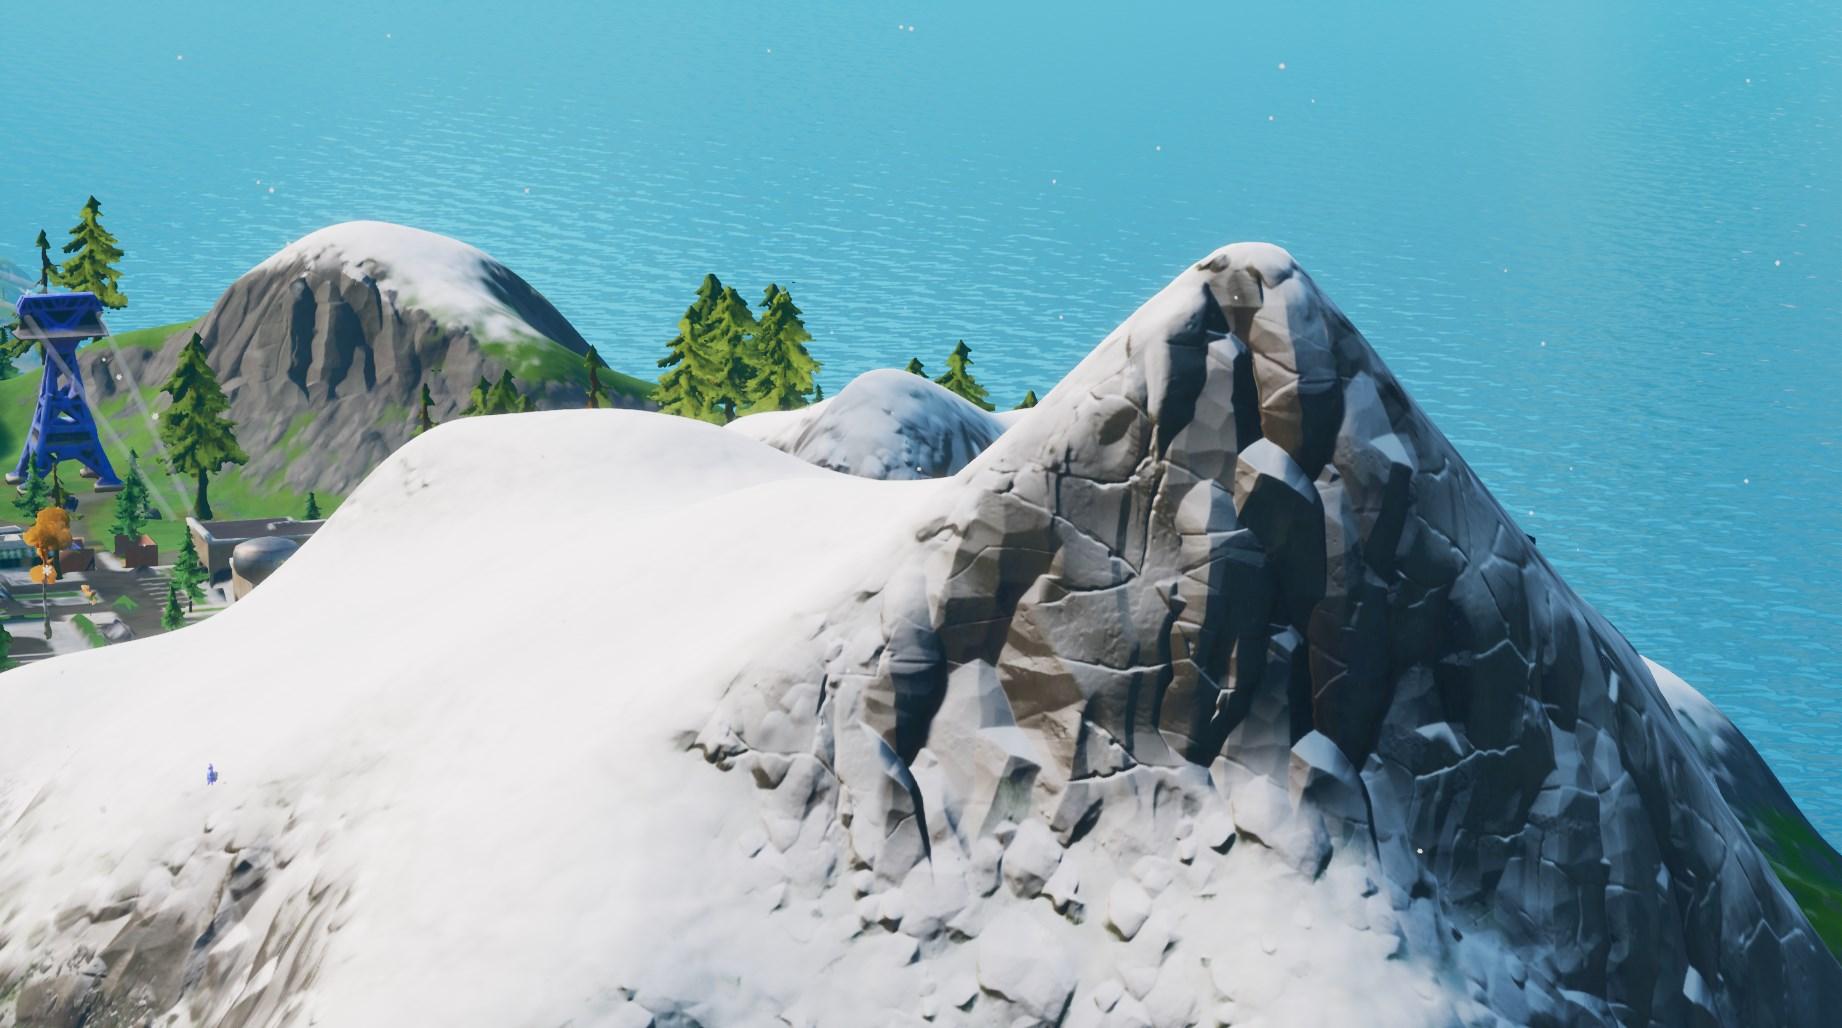 A mountain range in Fortnite Chapter 2, Season 1.